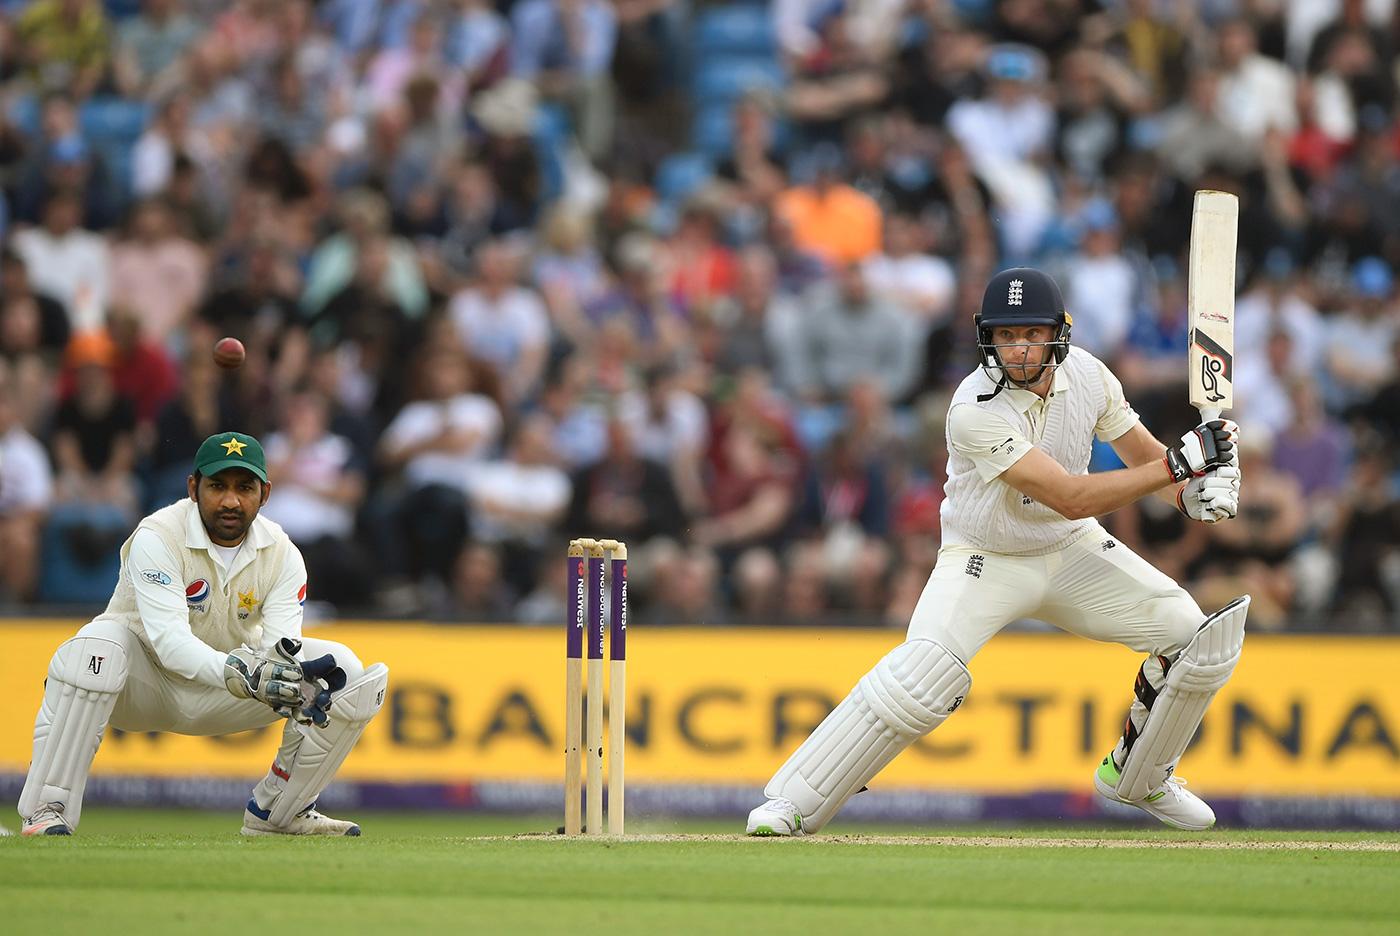 ICC Test Rankings: Jos Buttler Gain Big, Shadab Khan Also Move Up in Batsmen's Rankings 14